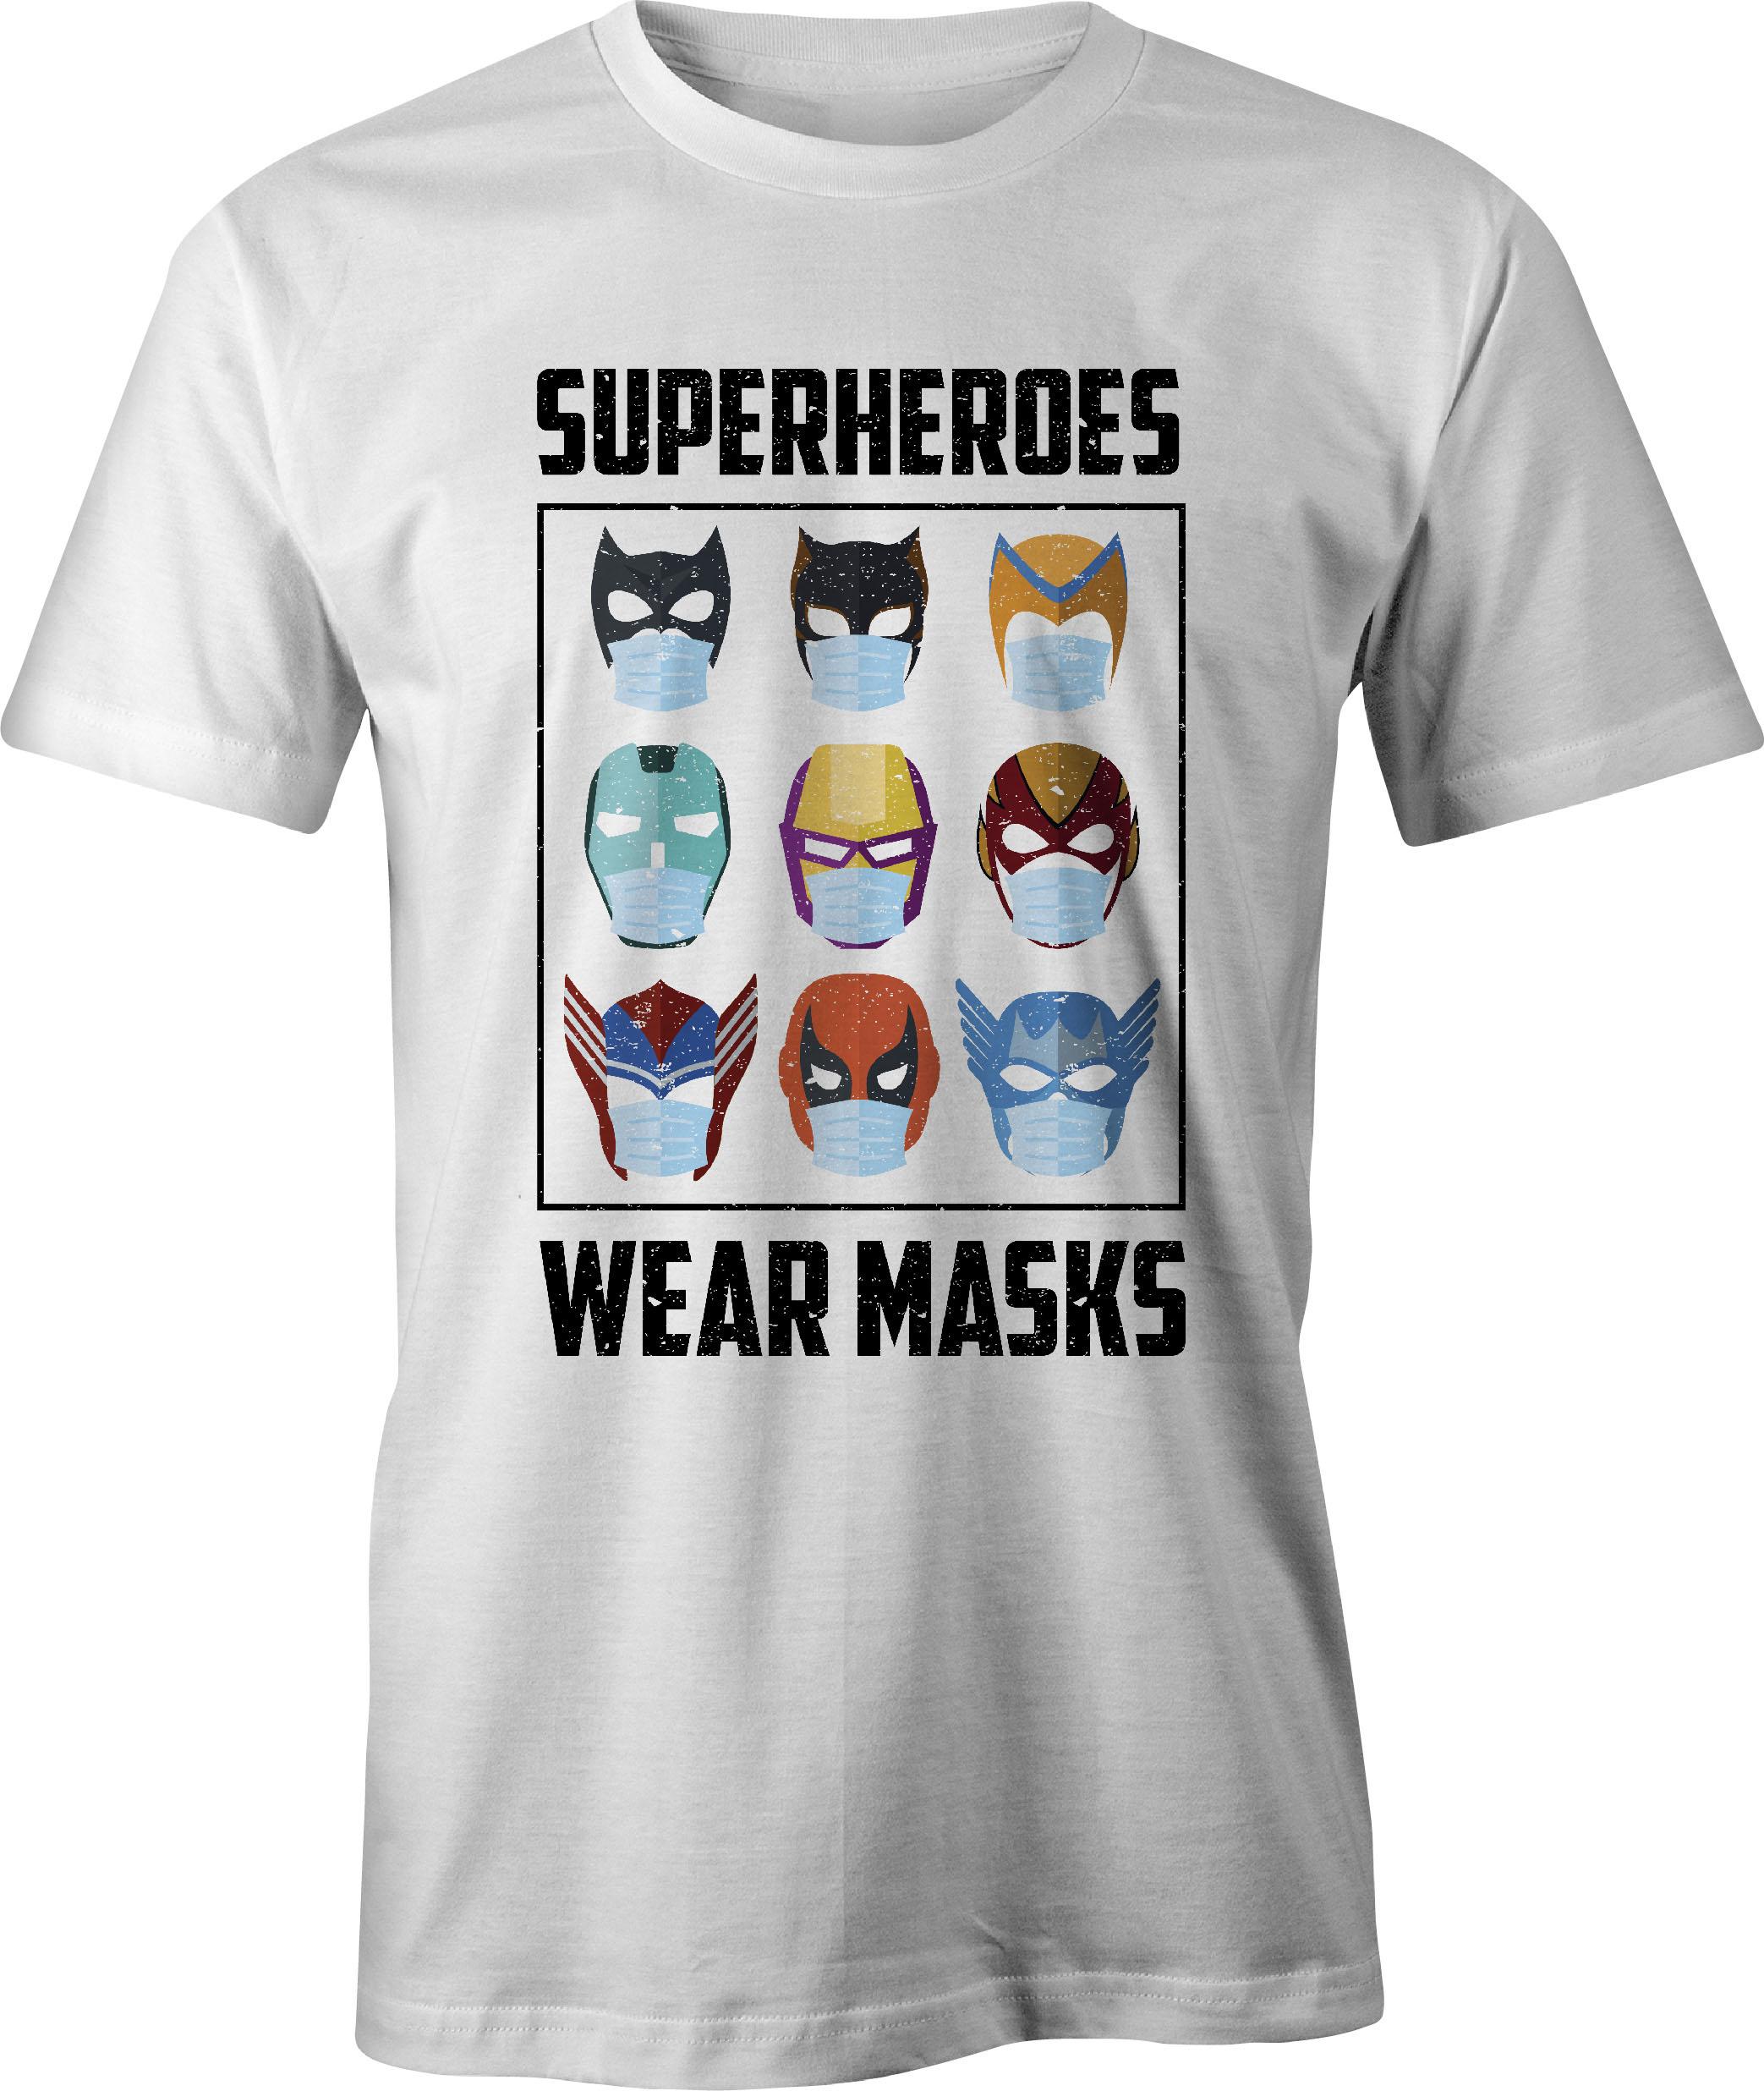 Superheroes Wear Masks T-Shirt in White